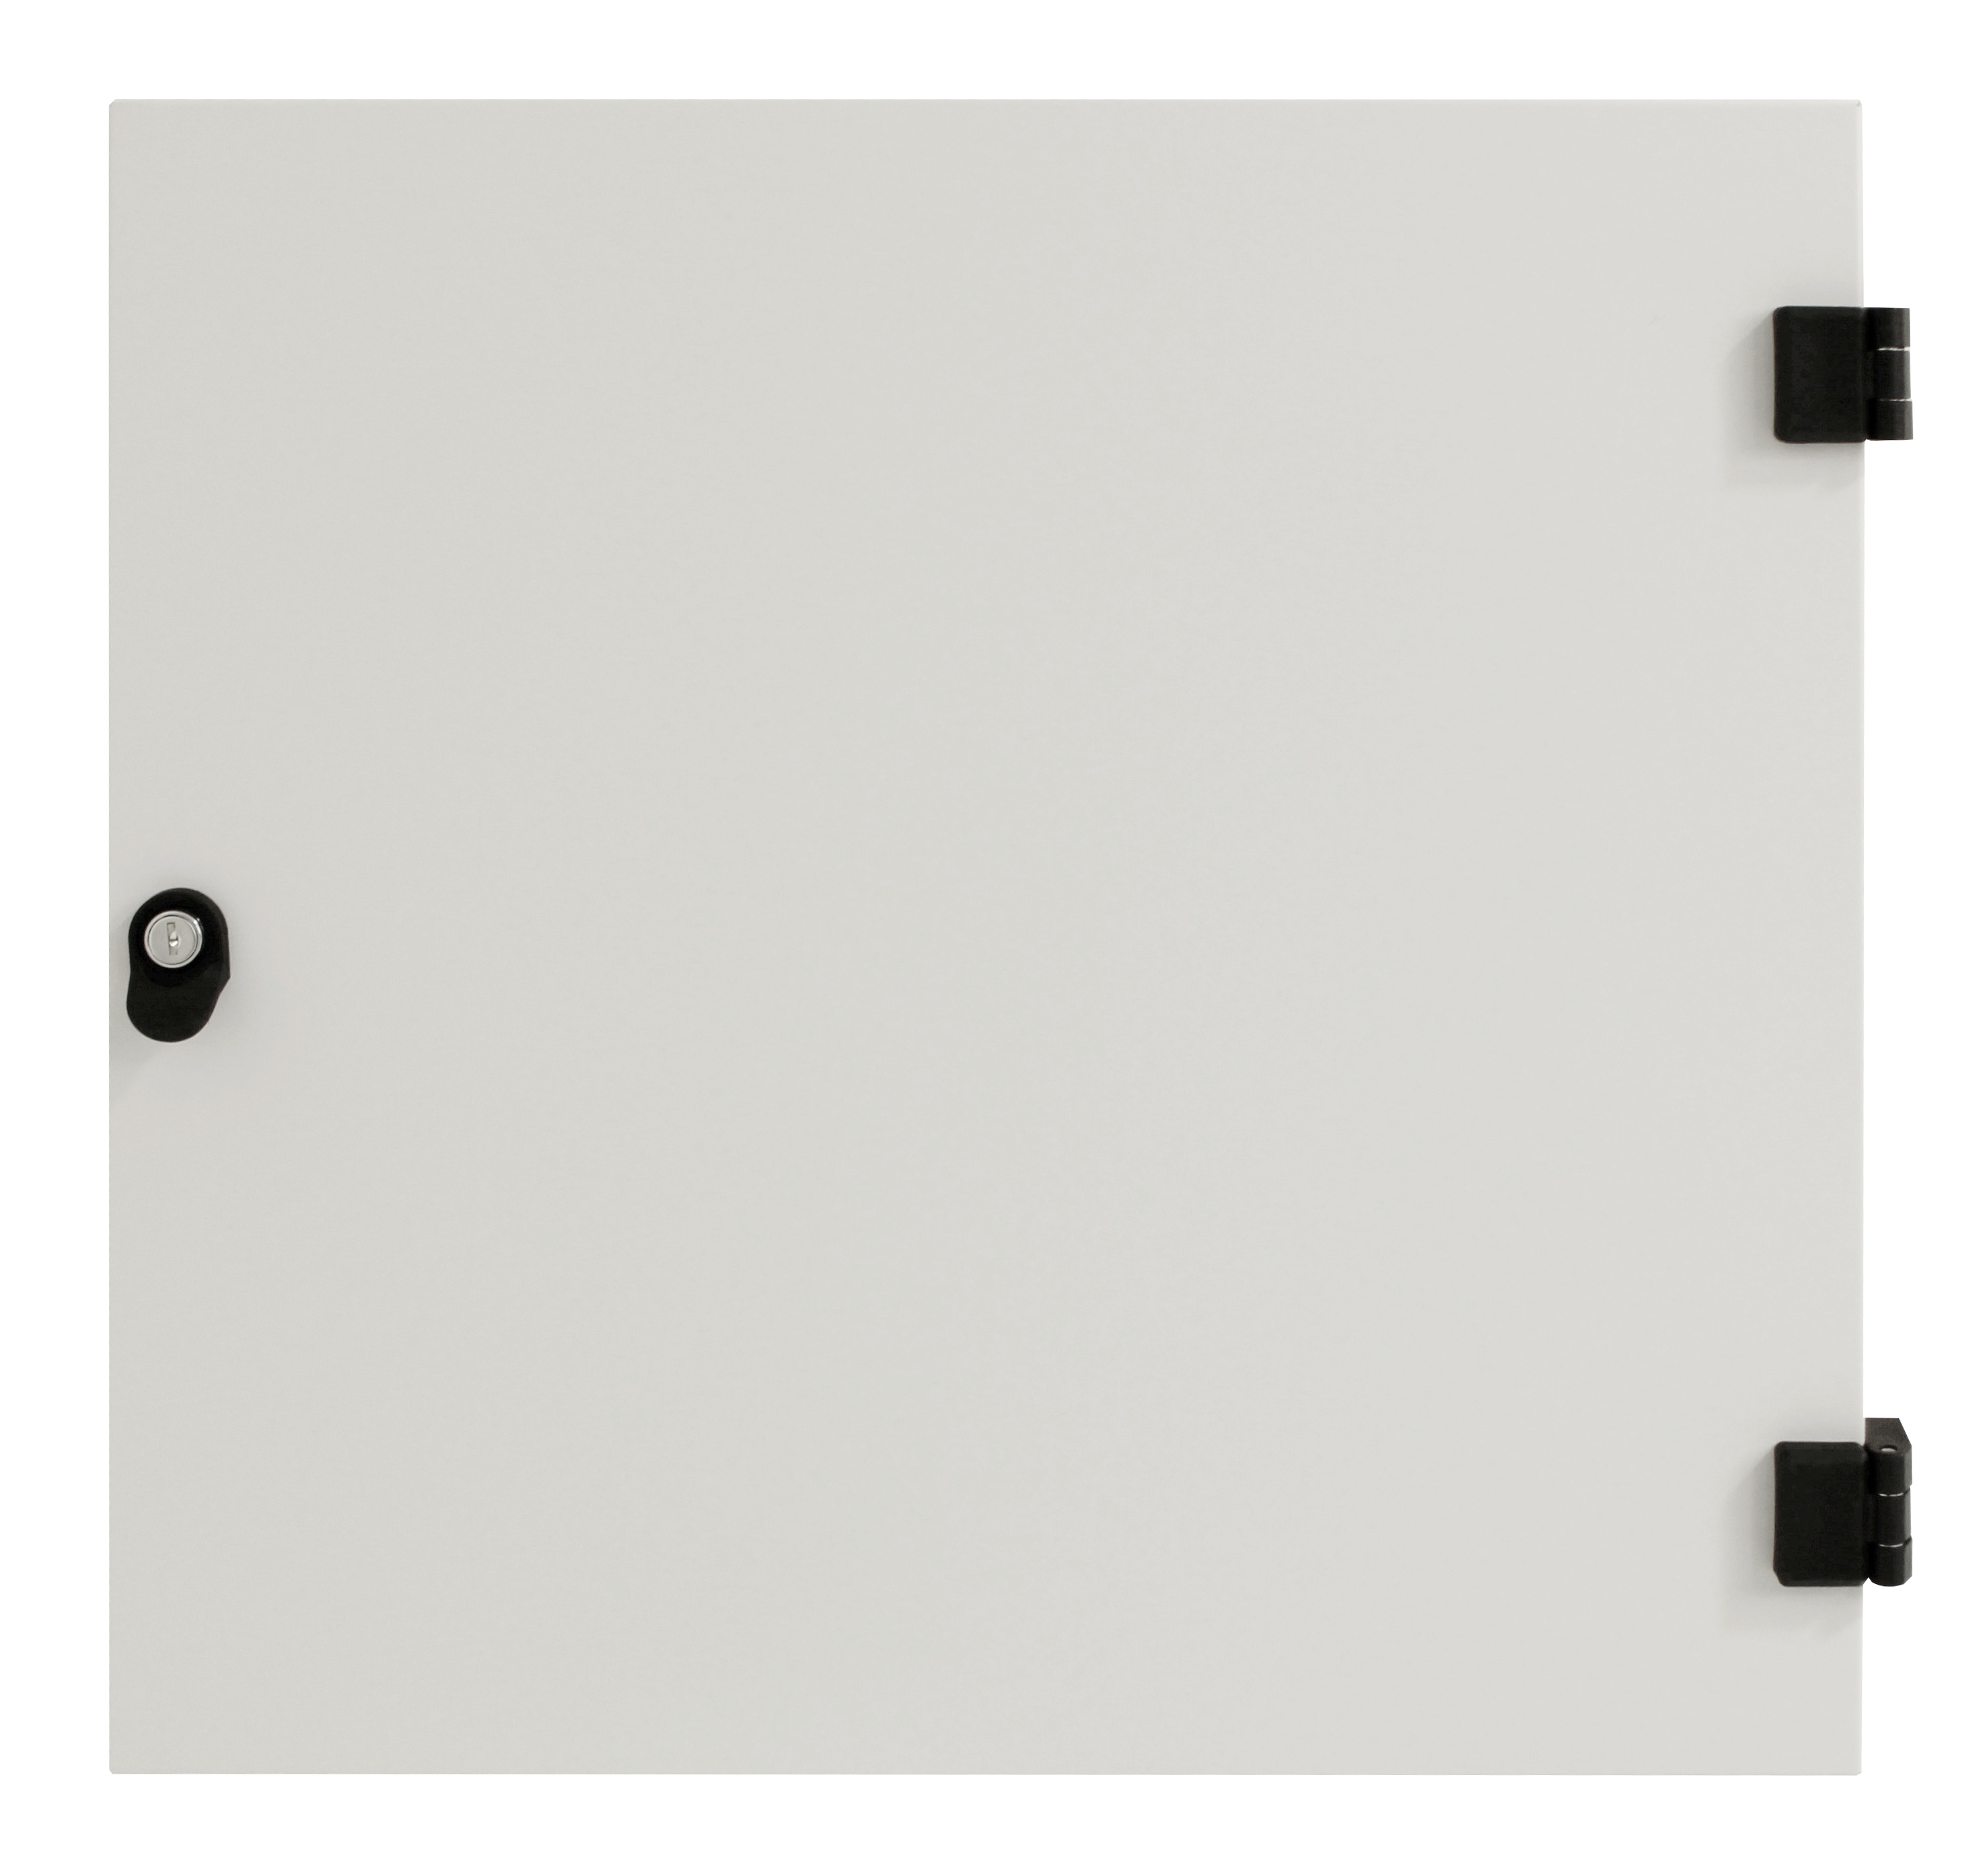 1 Stk Metall-Tür voll für DW-Schrank 6HE, B=600, RAL7035 DWRT0660--